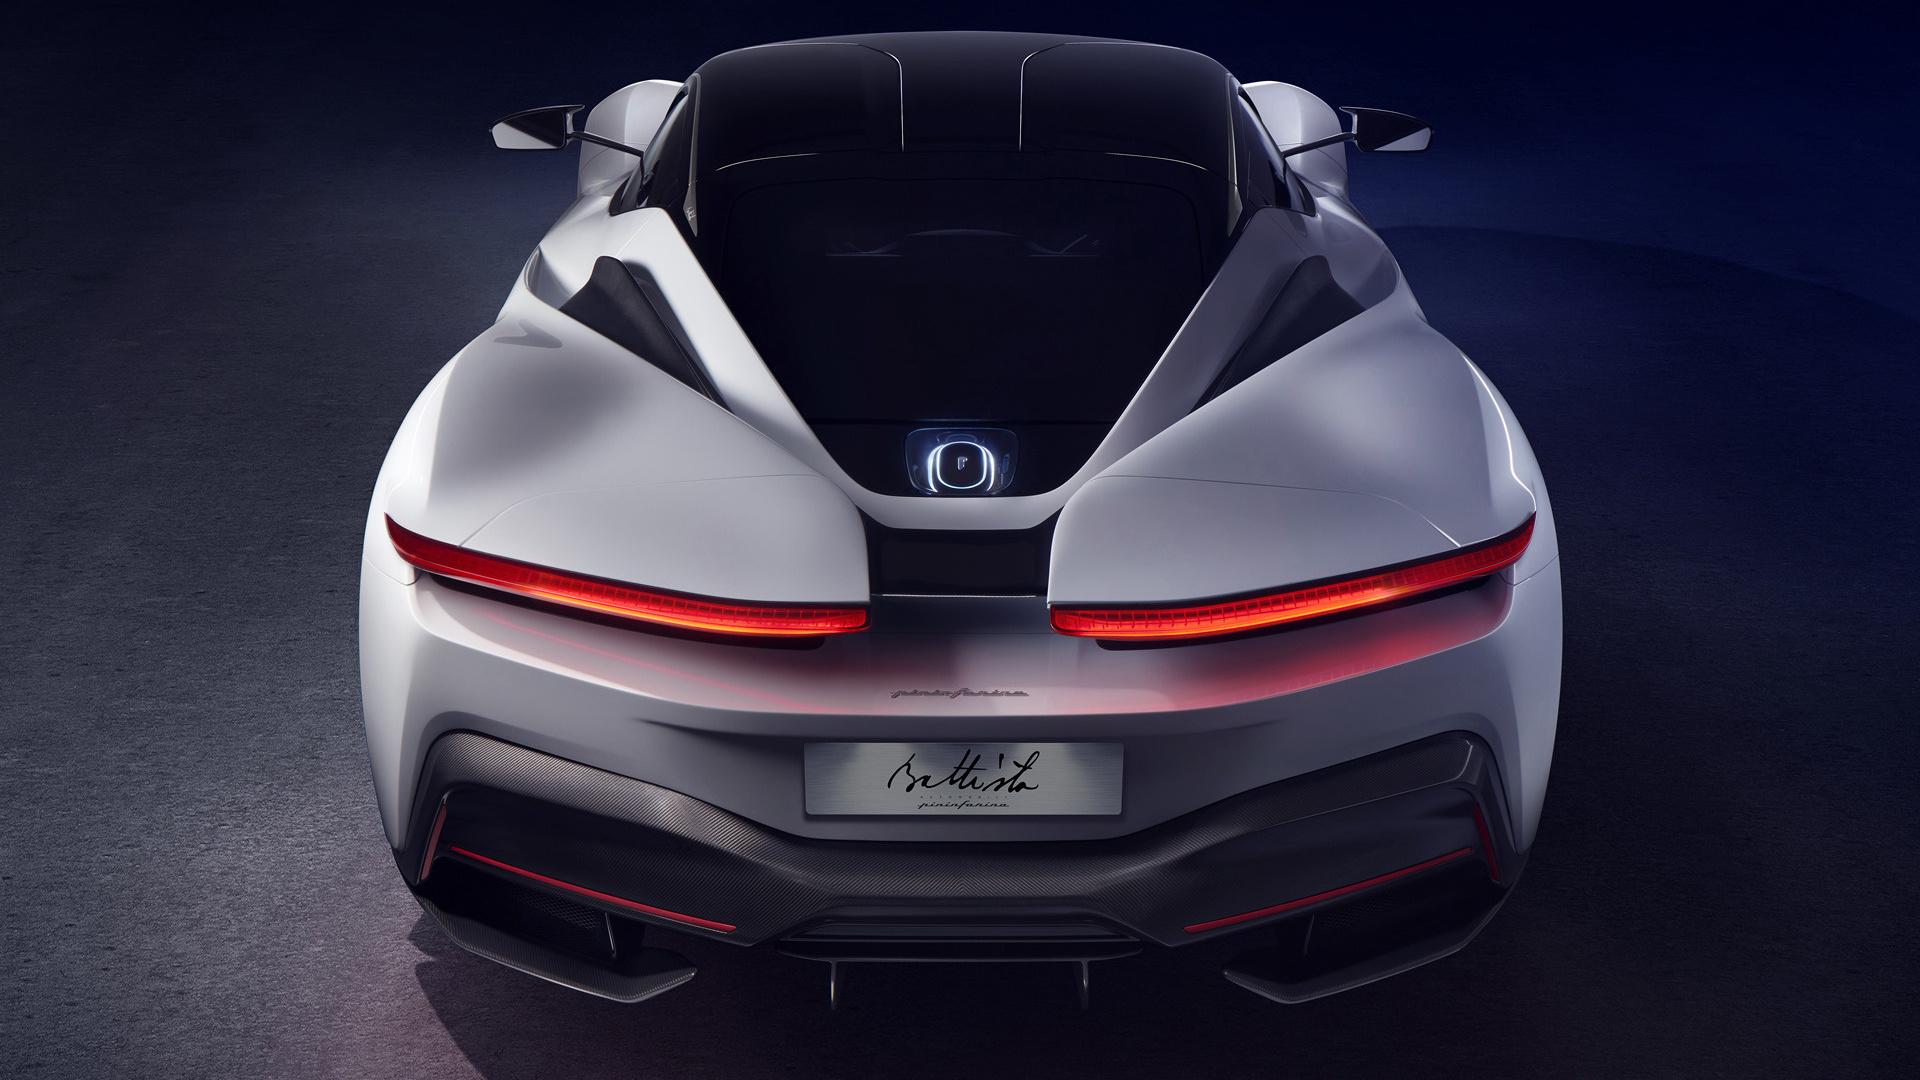 2020 Pininfarina Battista - Wallpapers and HD Images | Car ...